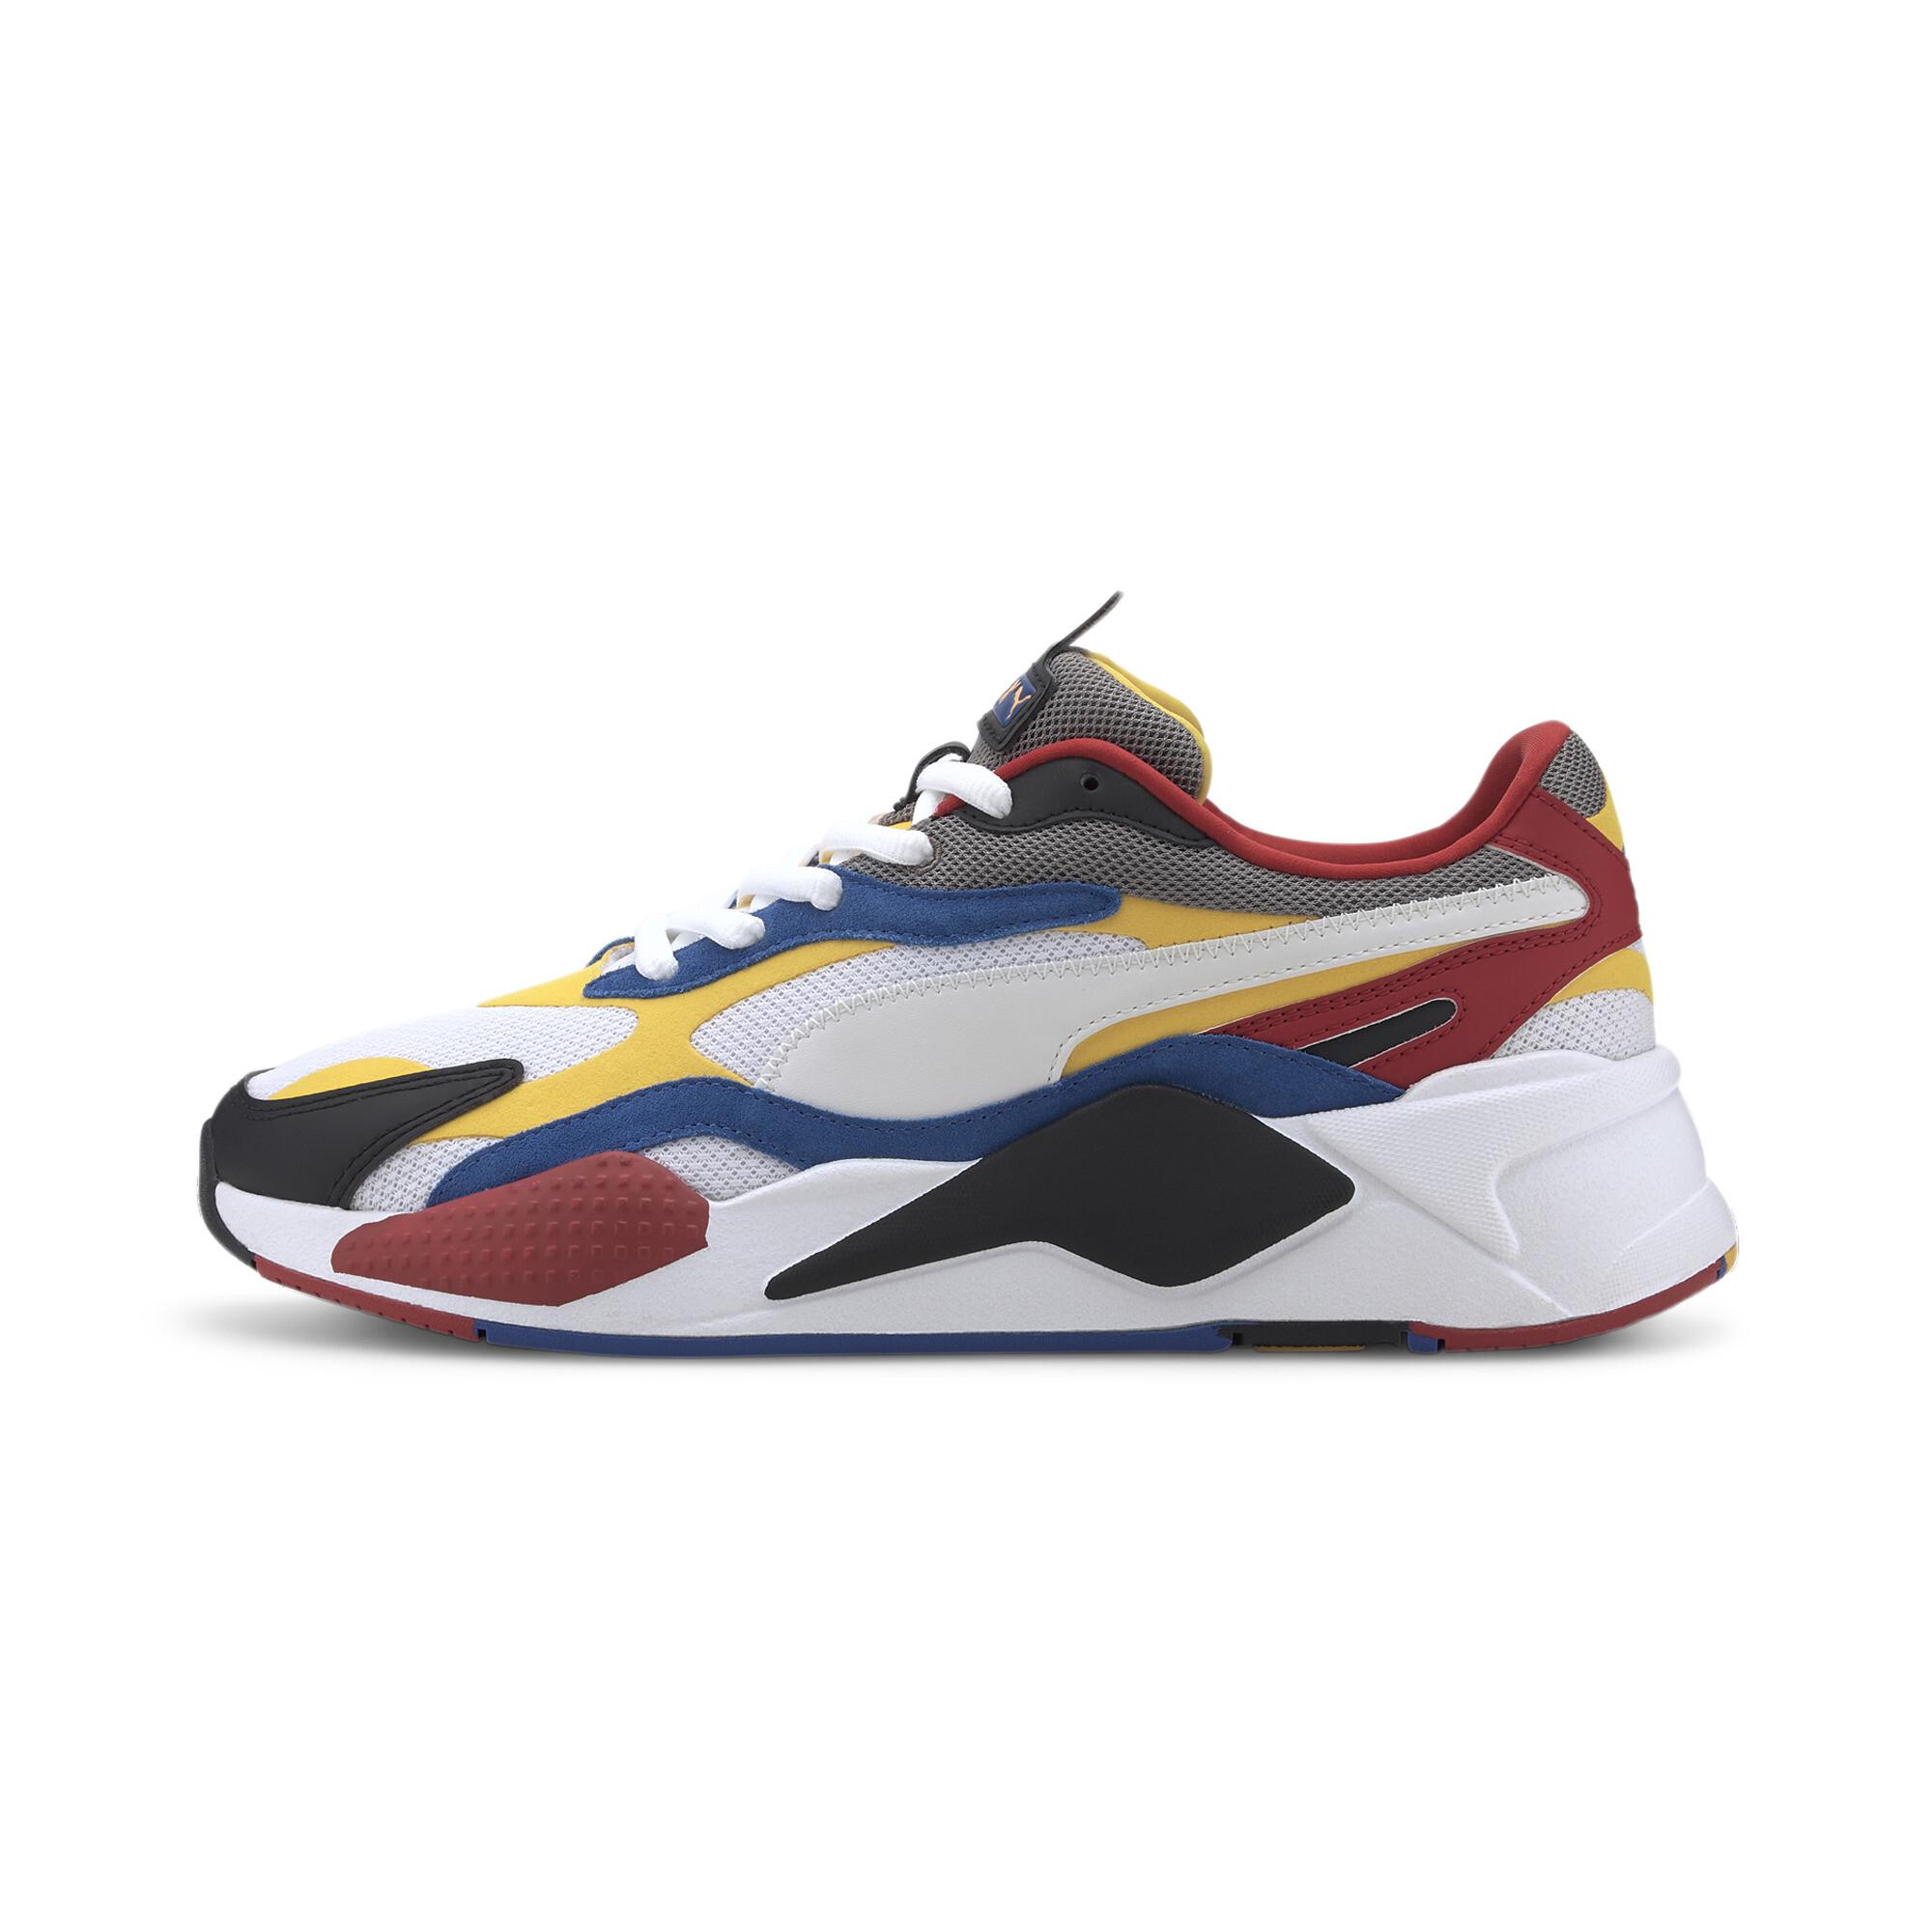 PUMA-Men-039-s-RS-X-Puzzle-Sneakers thumbnail 30